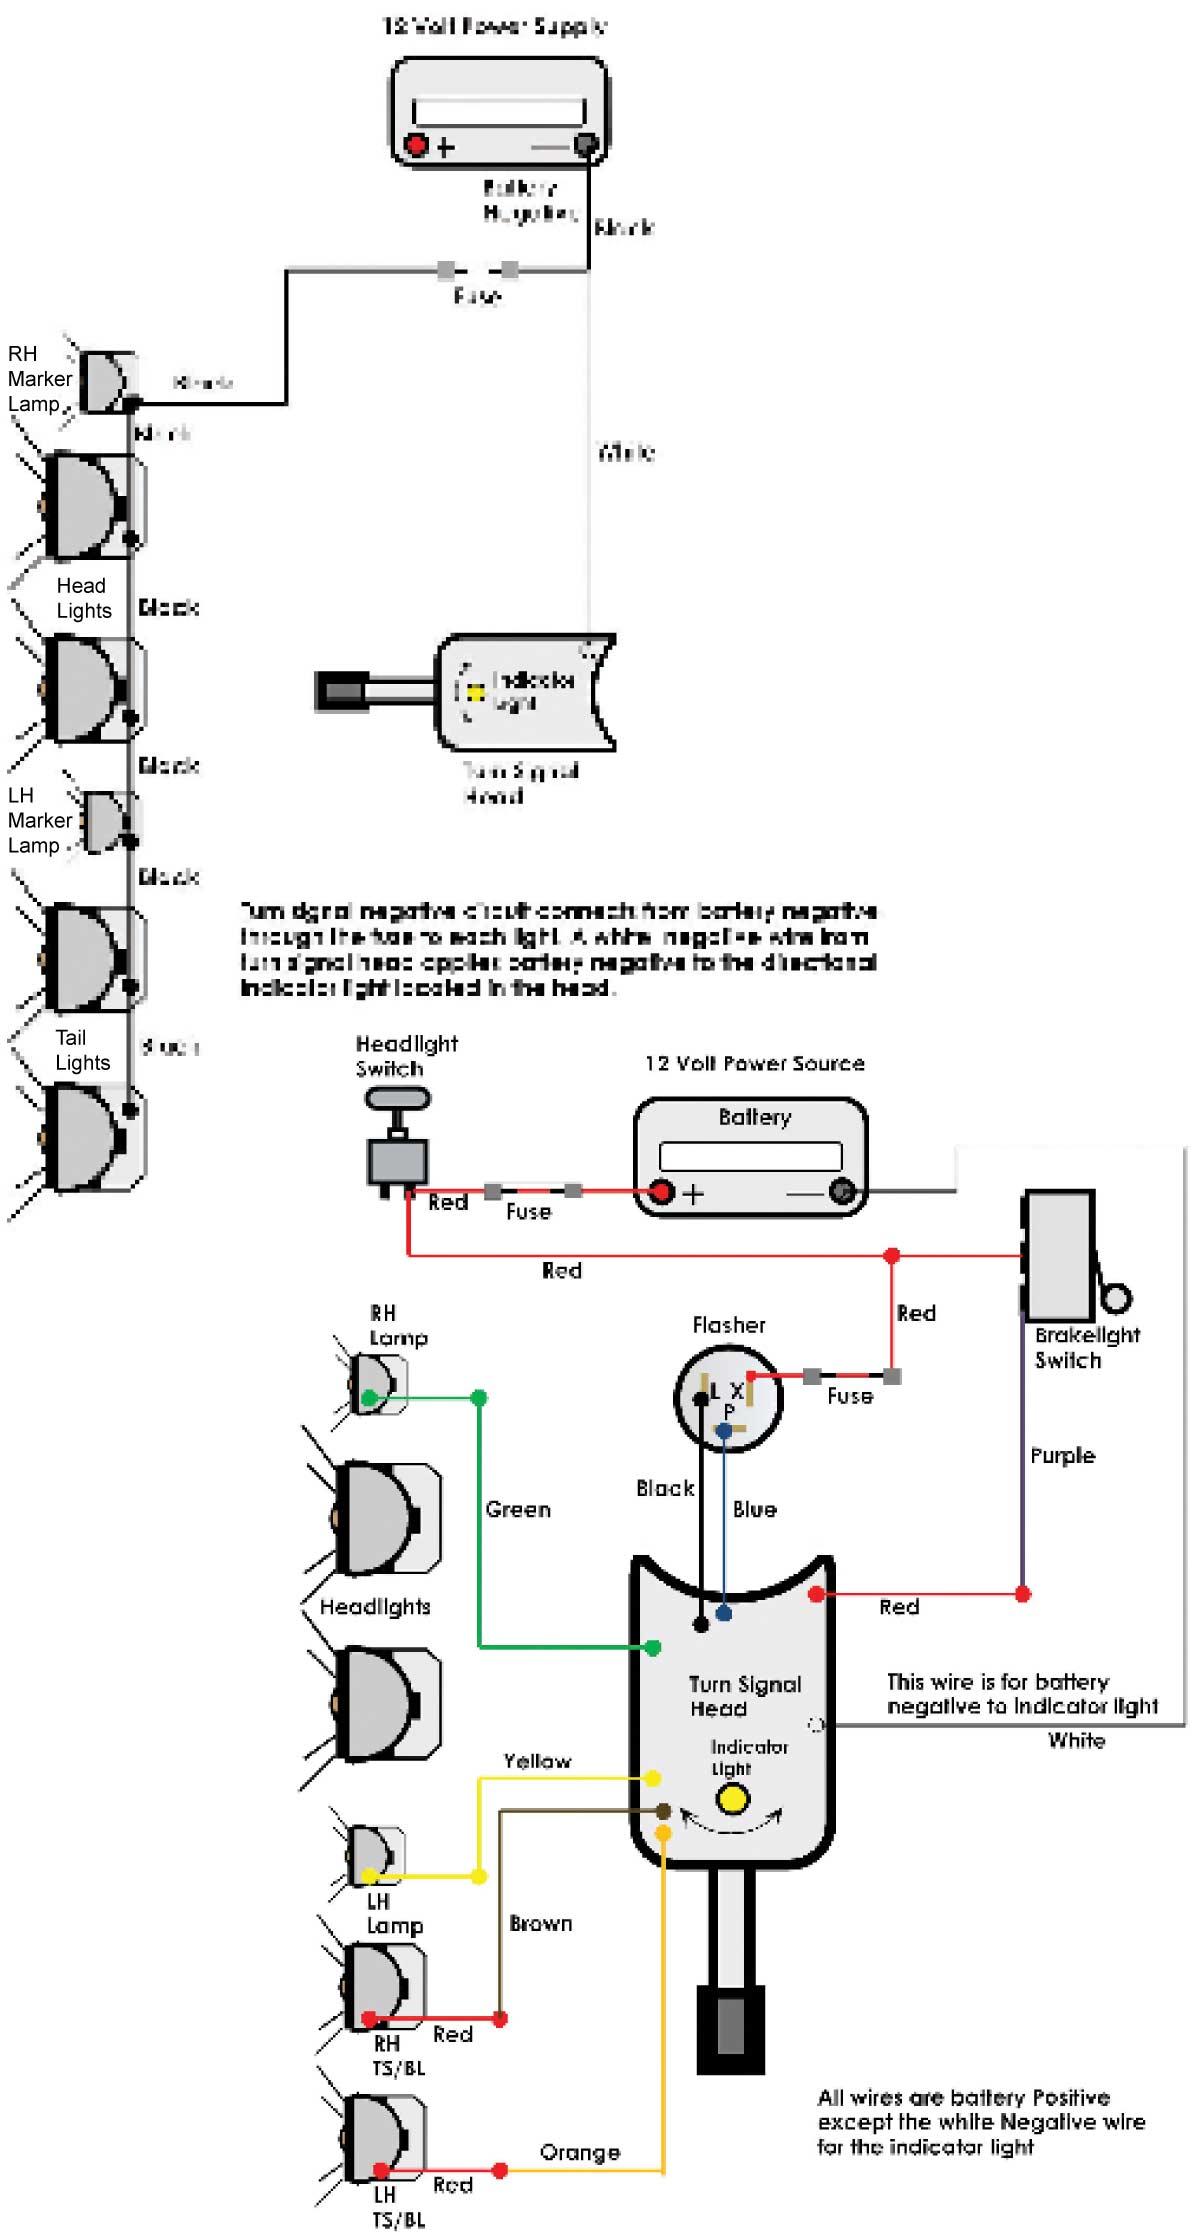 Golf Cart Turn Signal Wiring Diagram : signal, wiring, diagram, Signal, Wiring, Diagram, Cute-contact, Cute-contact.pennyapp.it